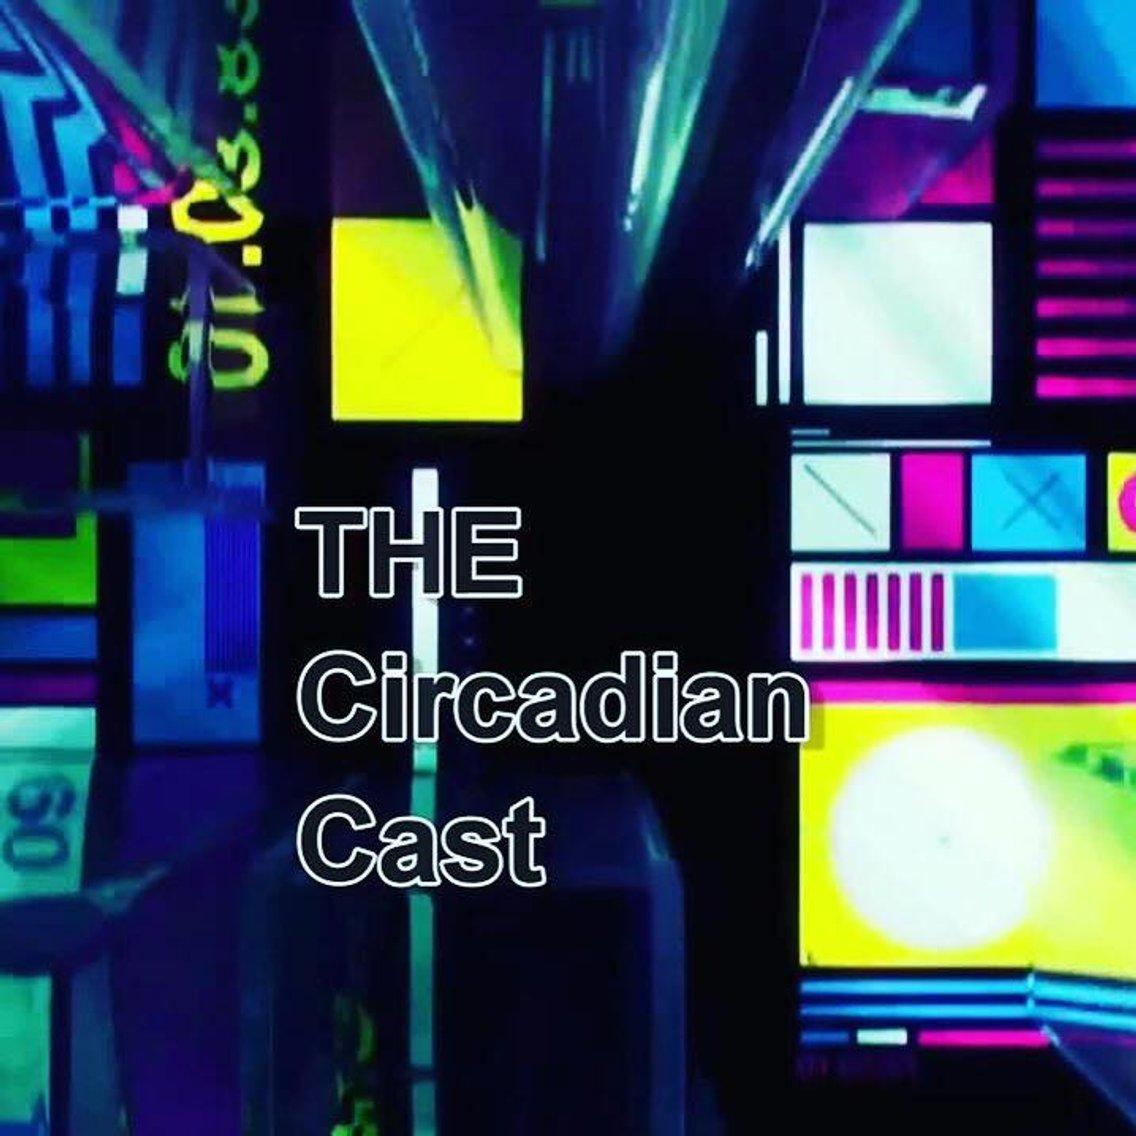 The Circadian Cast - imagen de portada